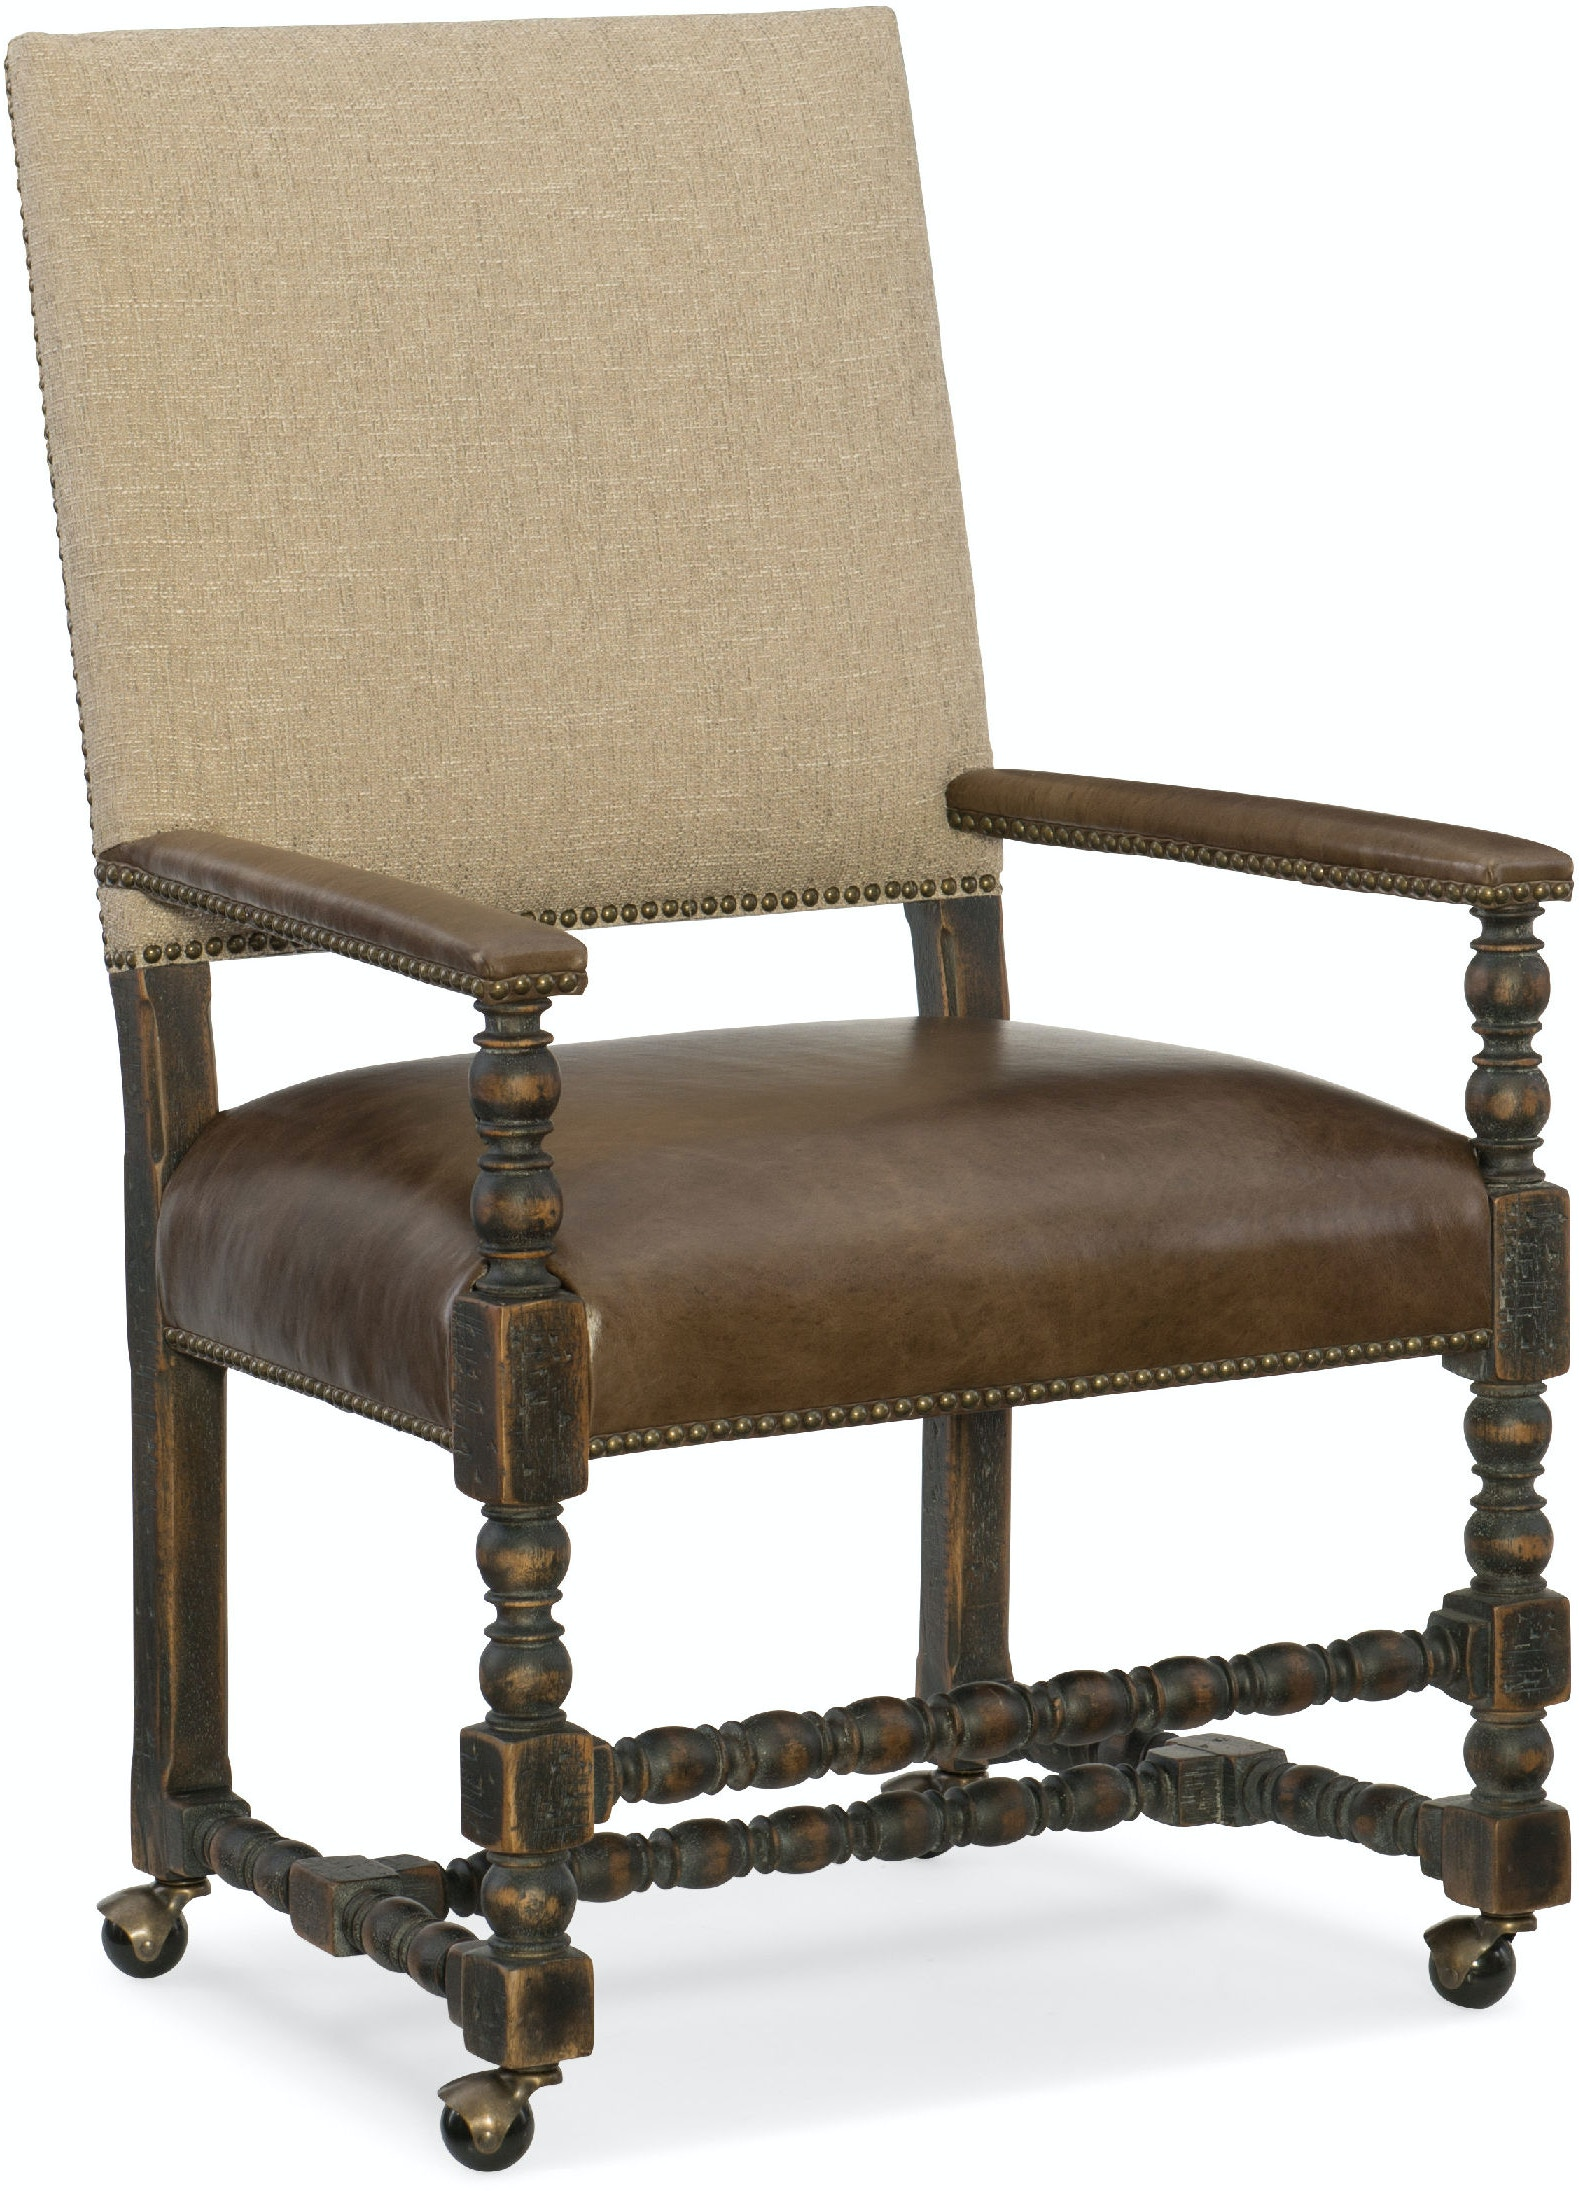 Hooker Furniture Dining Room Comfort Castered Game Chair  : 5960 75500 blk front from www.westcoastlivingoc.com size 1024 x 768 jpeg 41kB